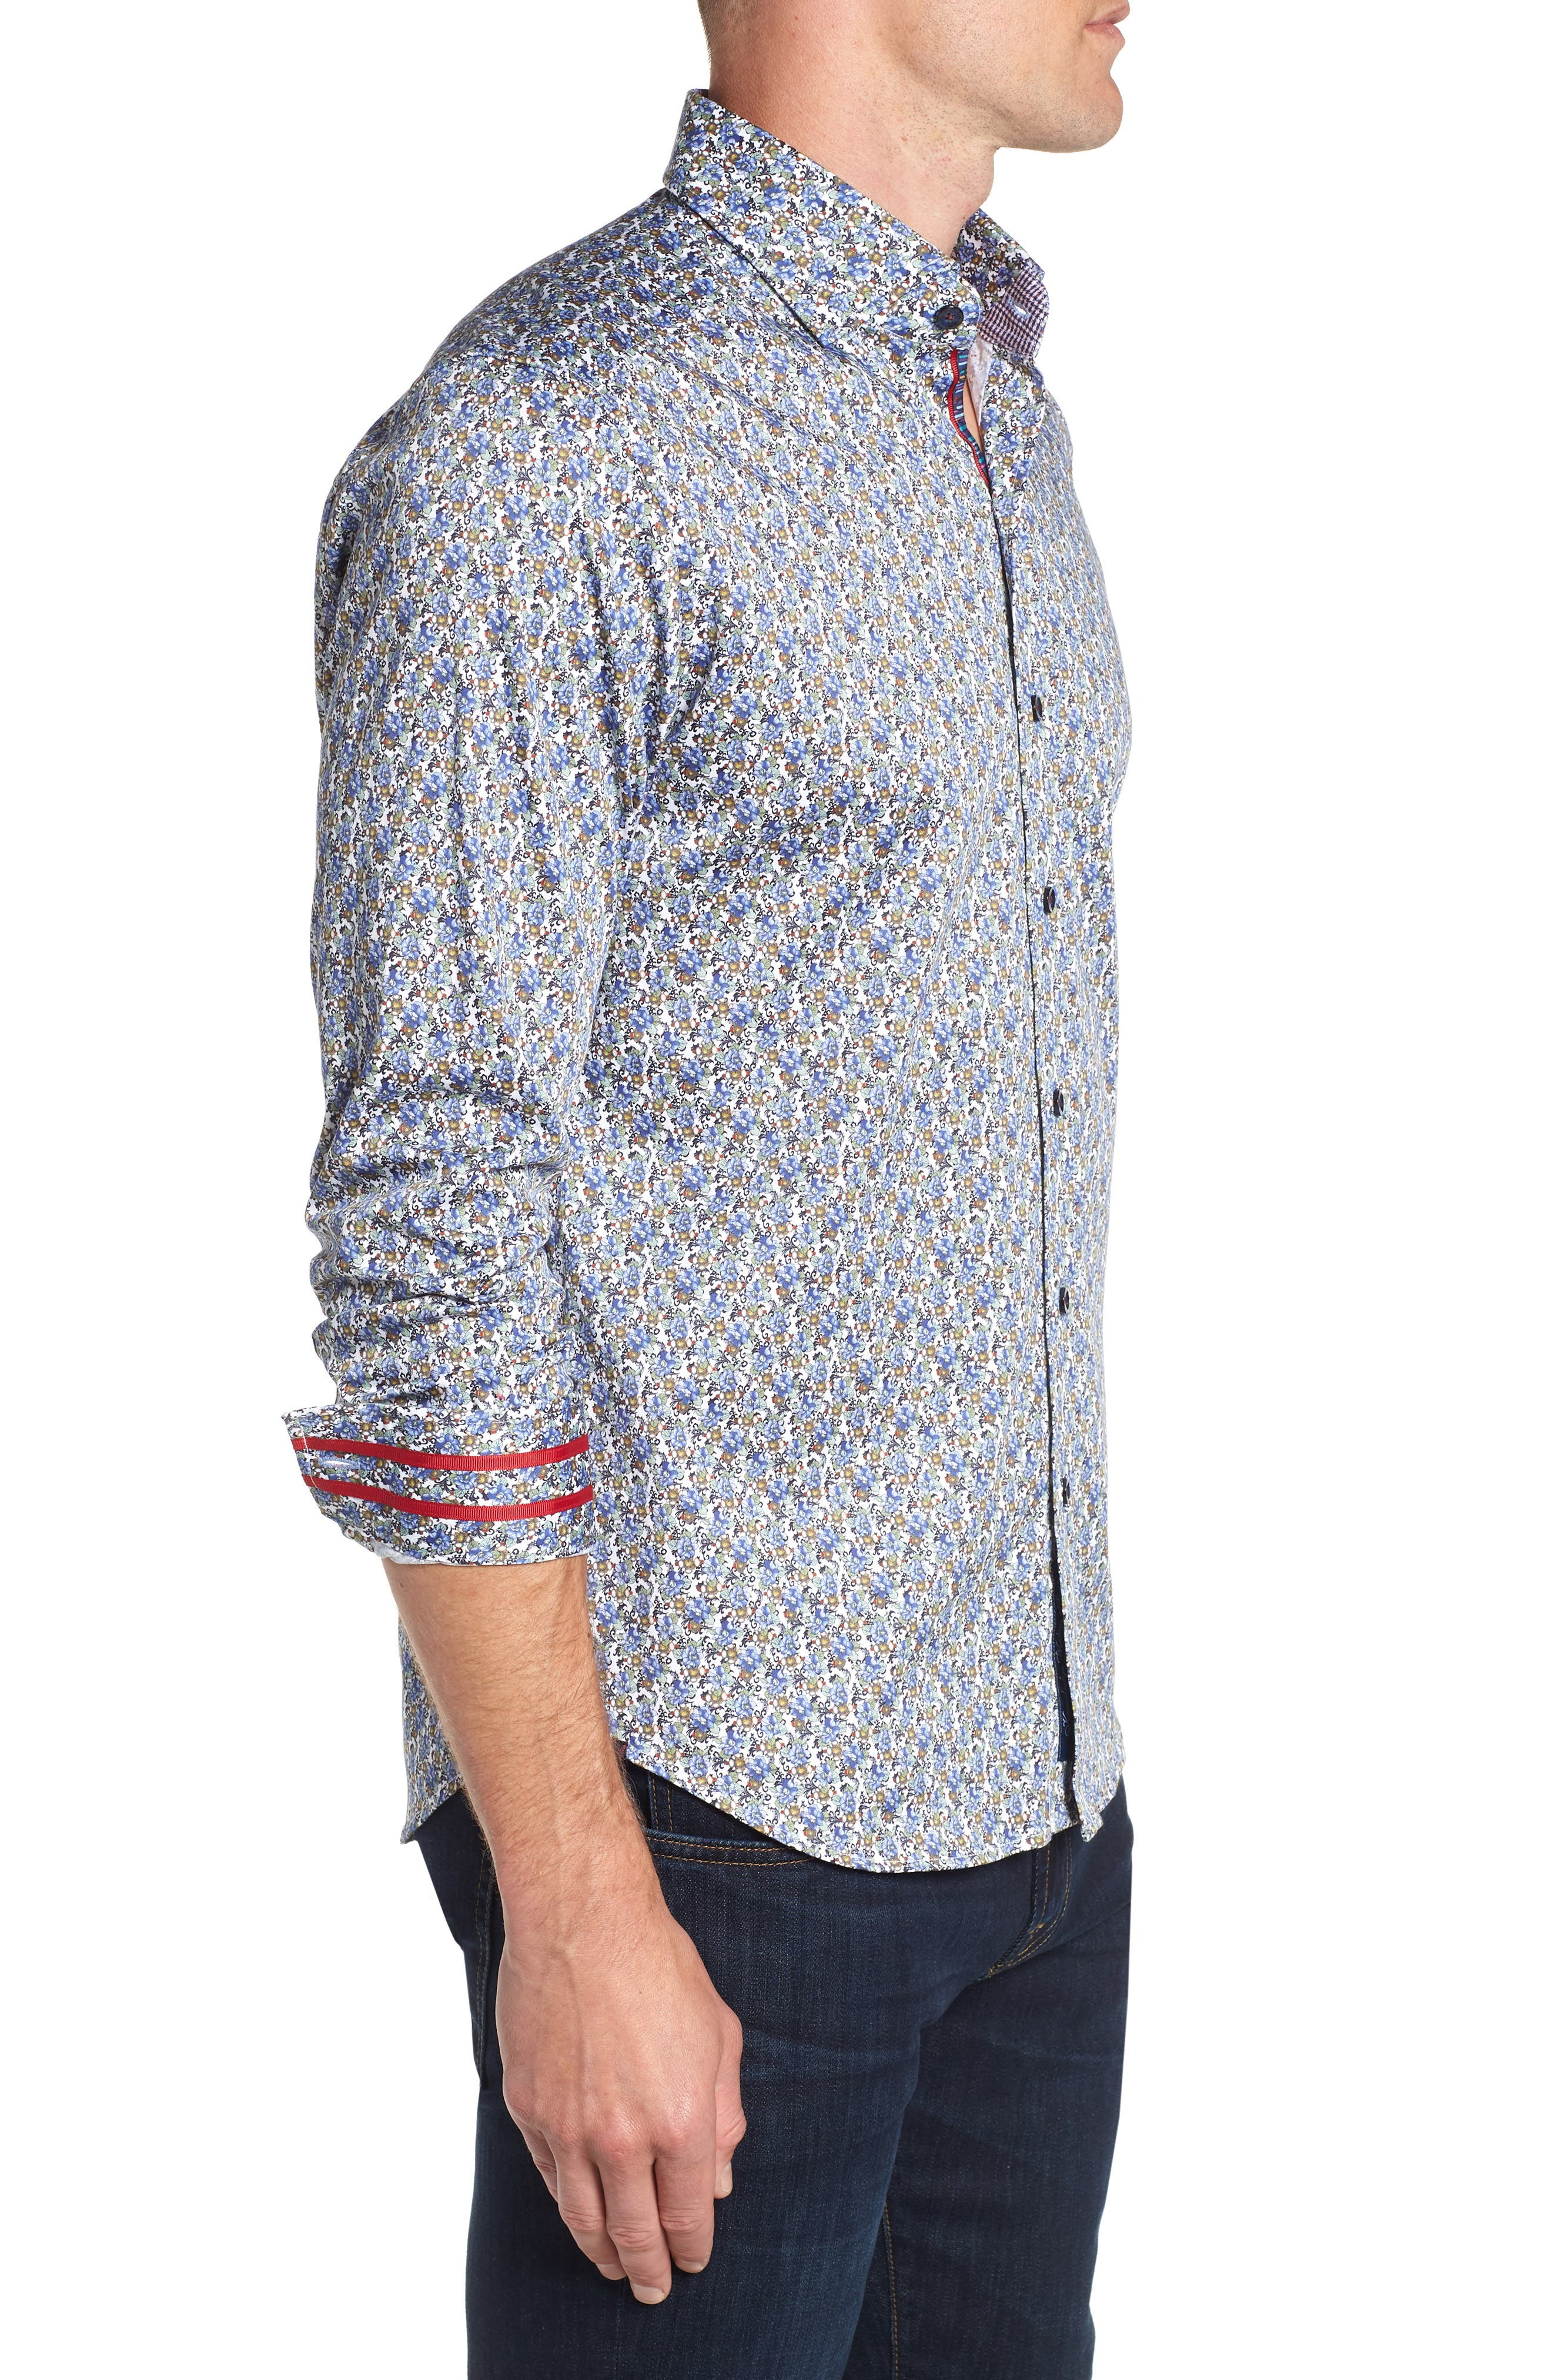 Richardson Tailored Fit Print Sport Shirt,                             Alternate thumbnail 4, color,                             400